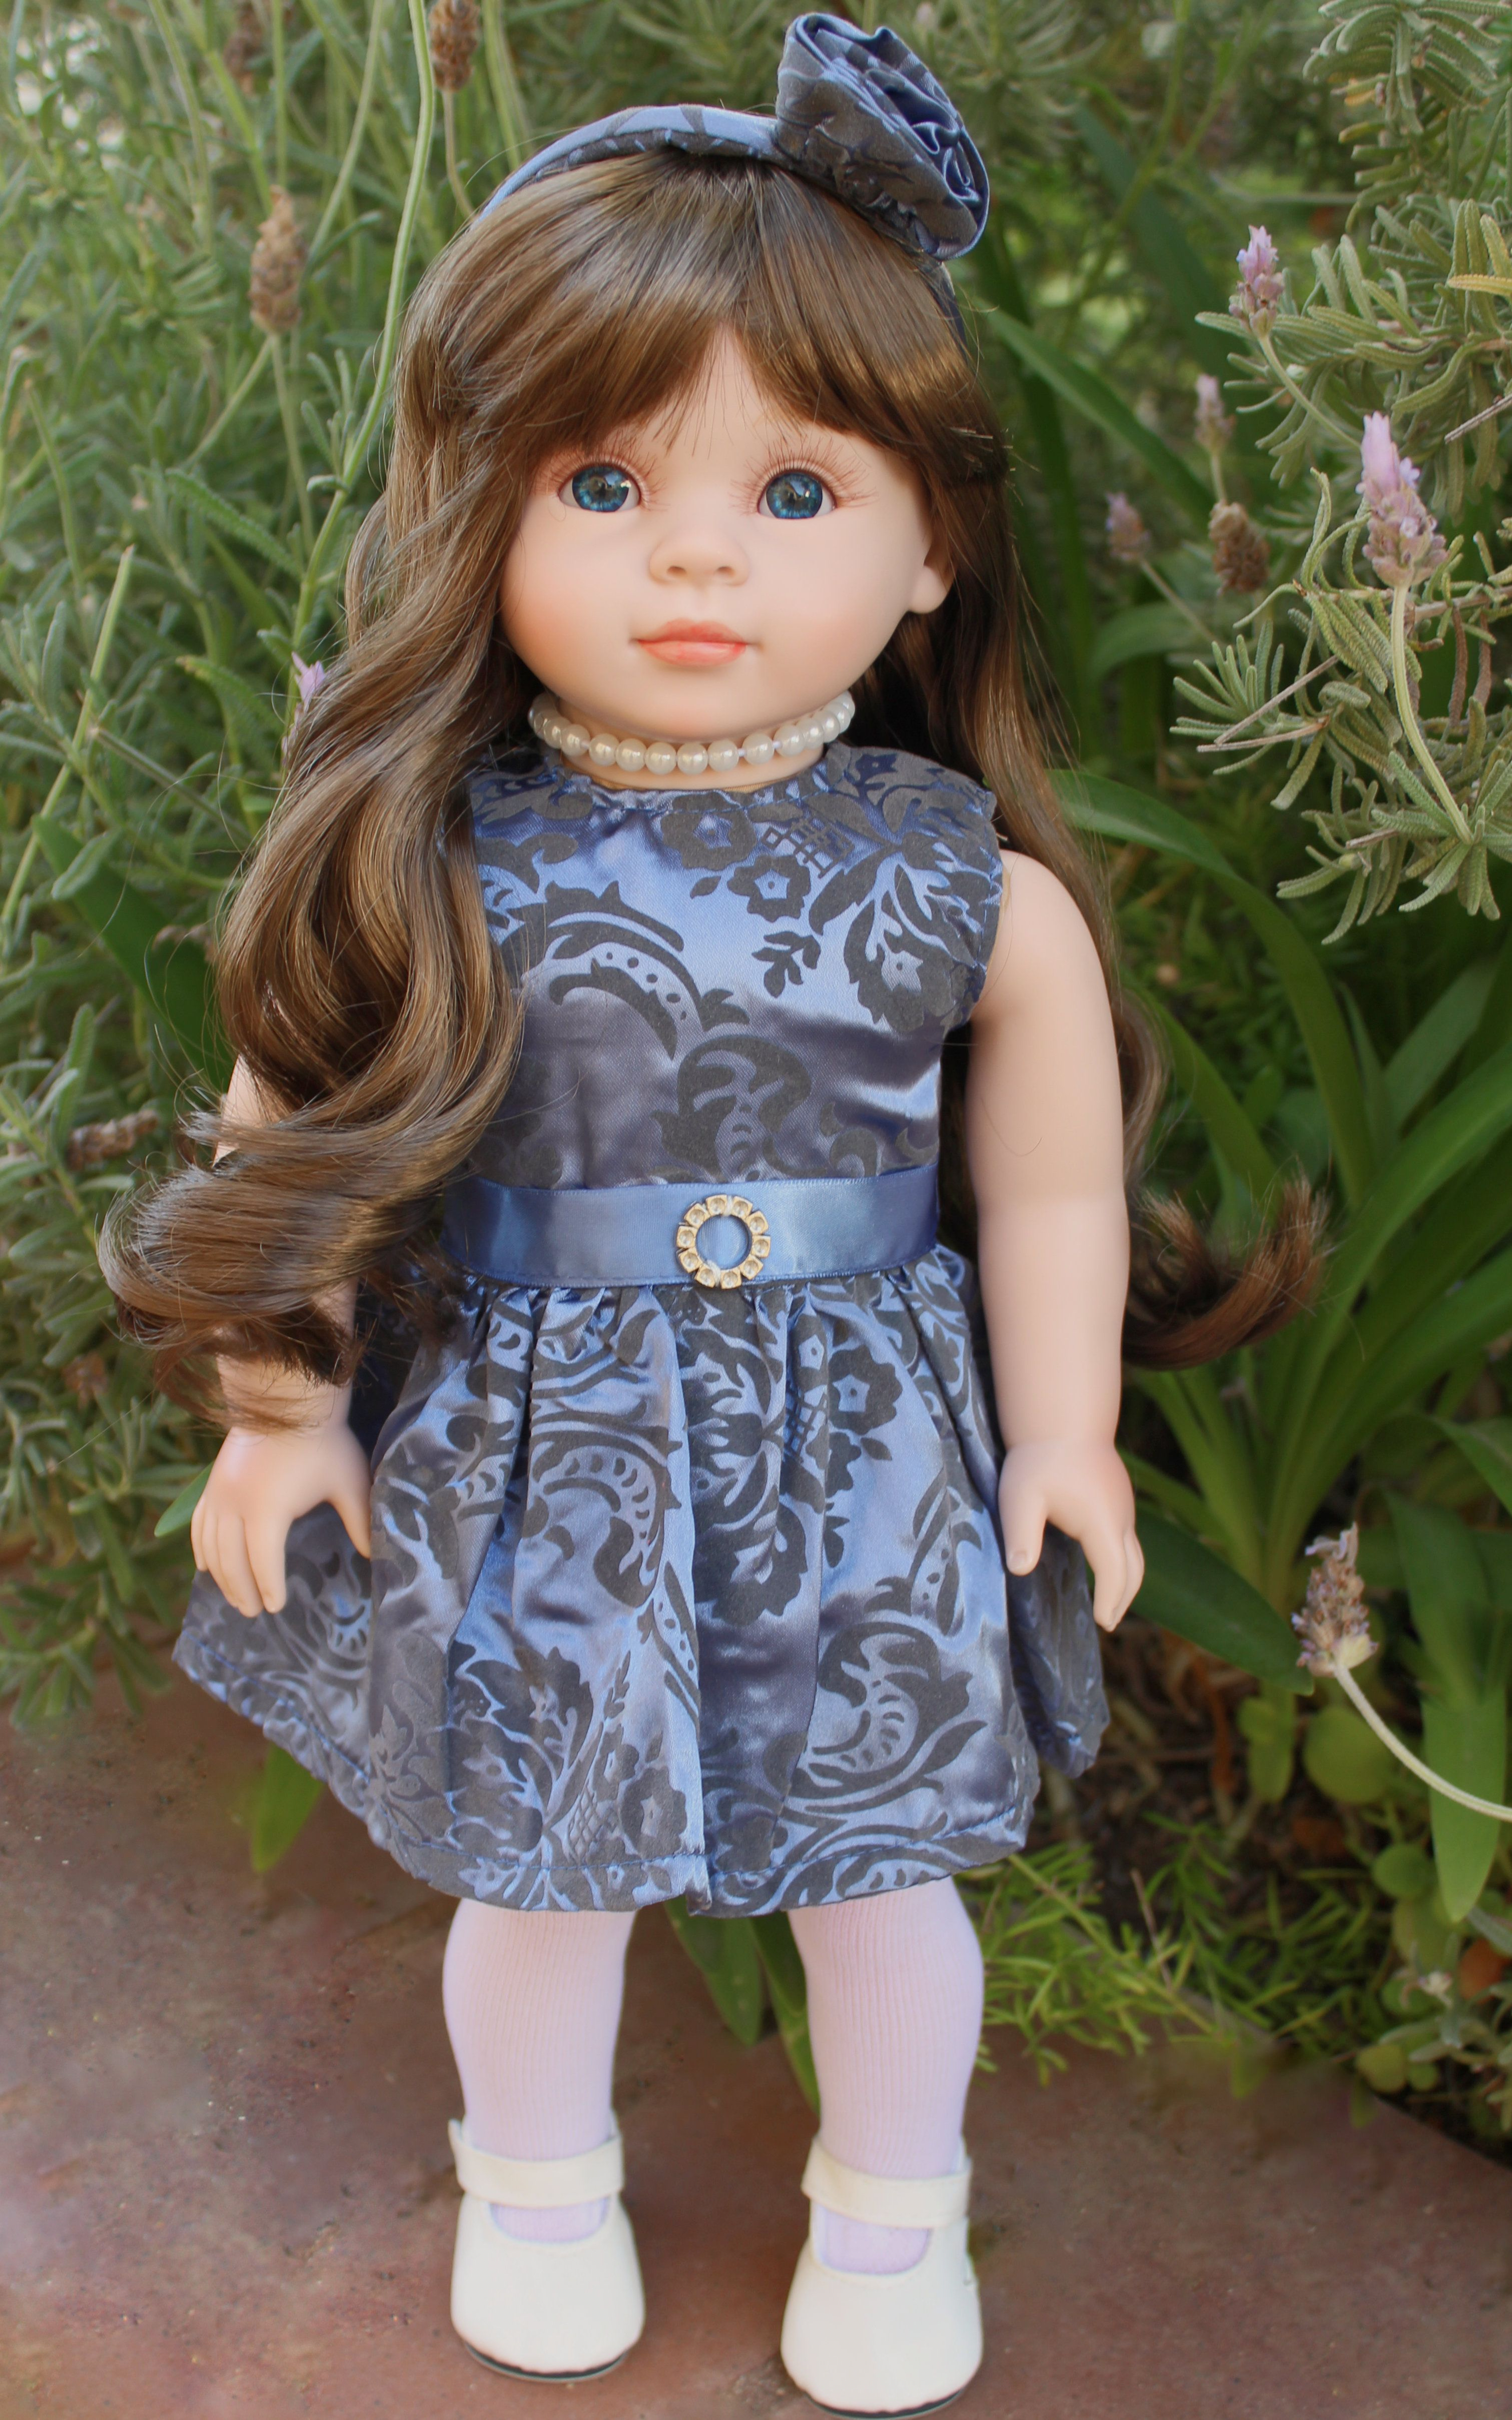 HARMONY CLUB DOLLS 18 Inch Dolls. 18 inch Doll Clothes. Fits the American Girl Doll. Visit our doll store at www.harmonyclubdolls.com